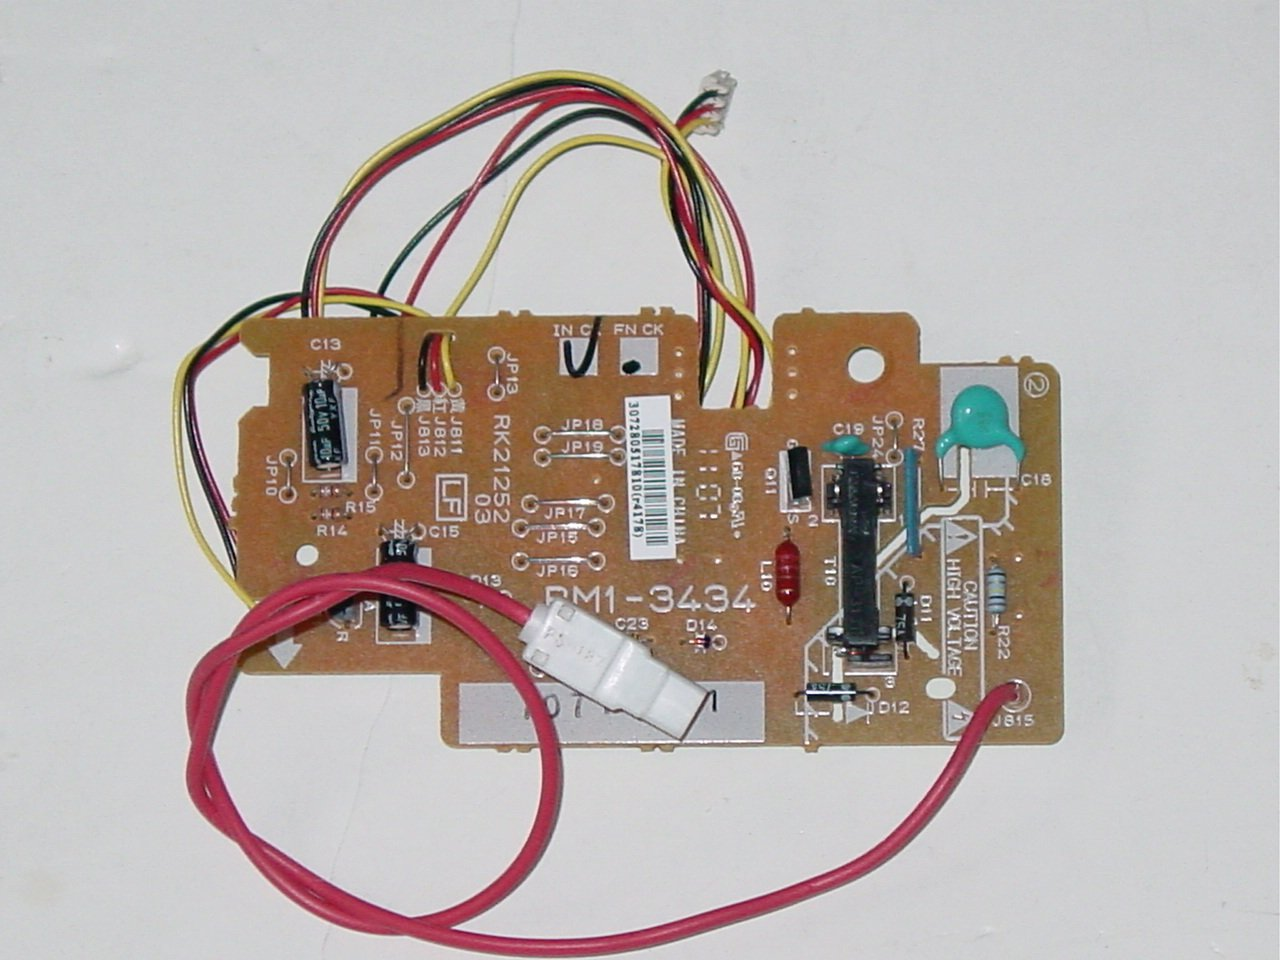 HP RM1-3434 LaserJet Color  Printer Sub-High Voltage Power Supply Control Board